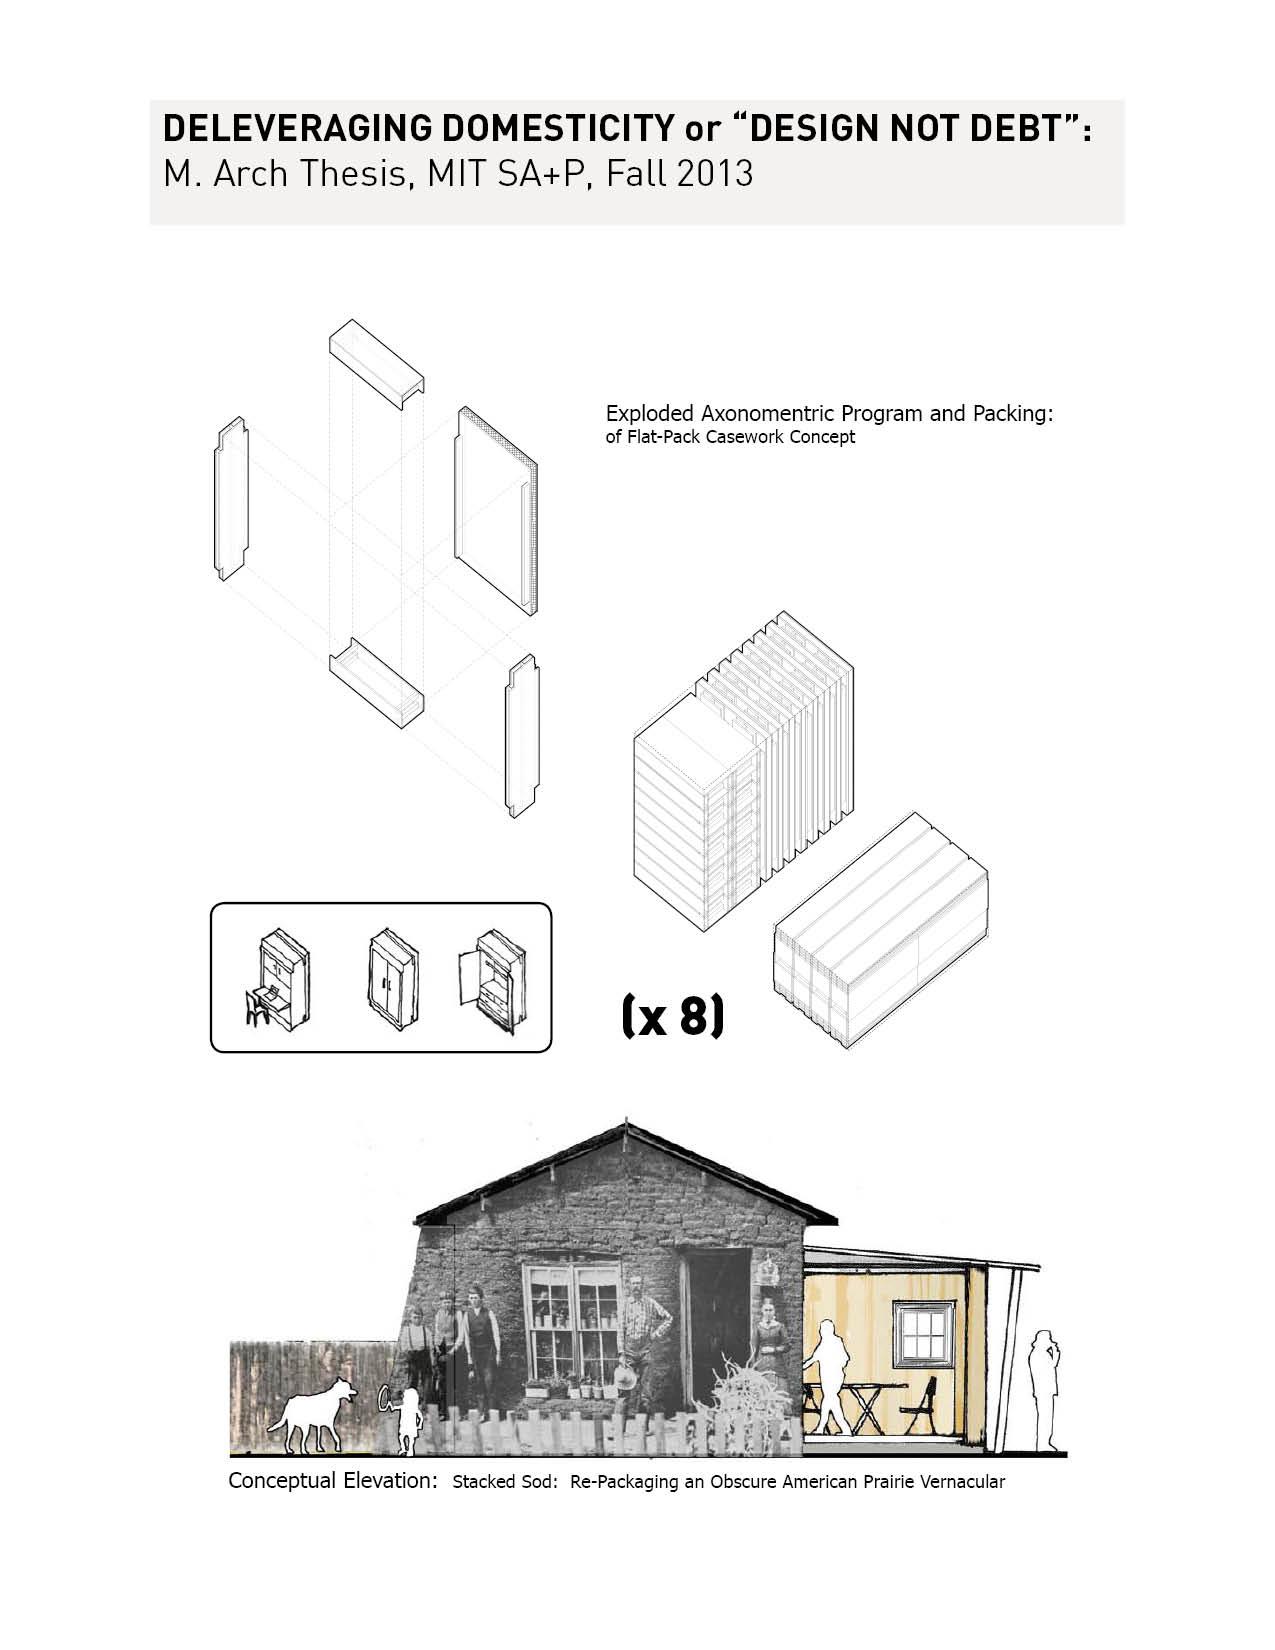 MIT_thesis20.jpg